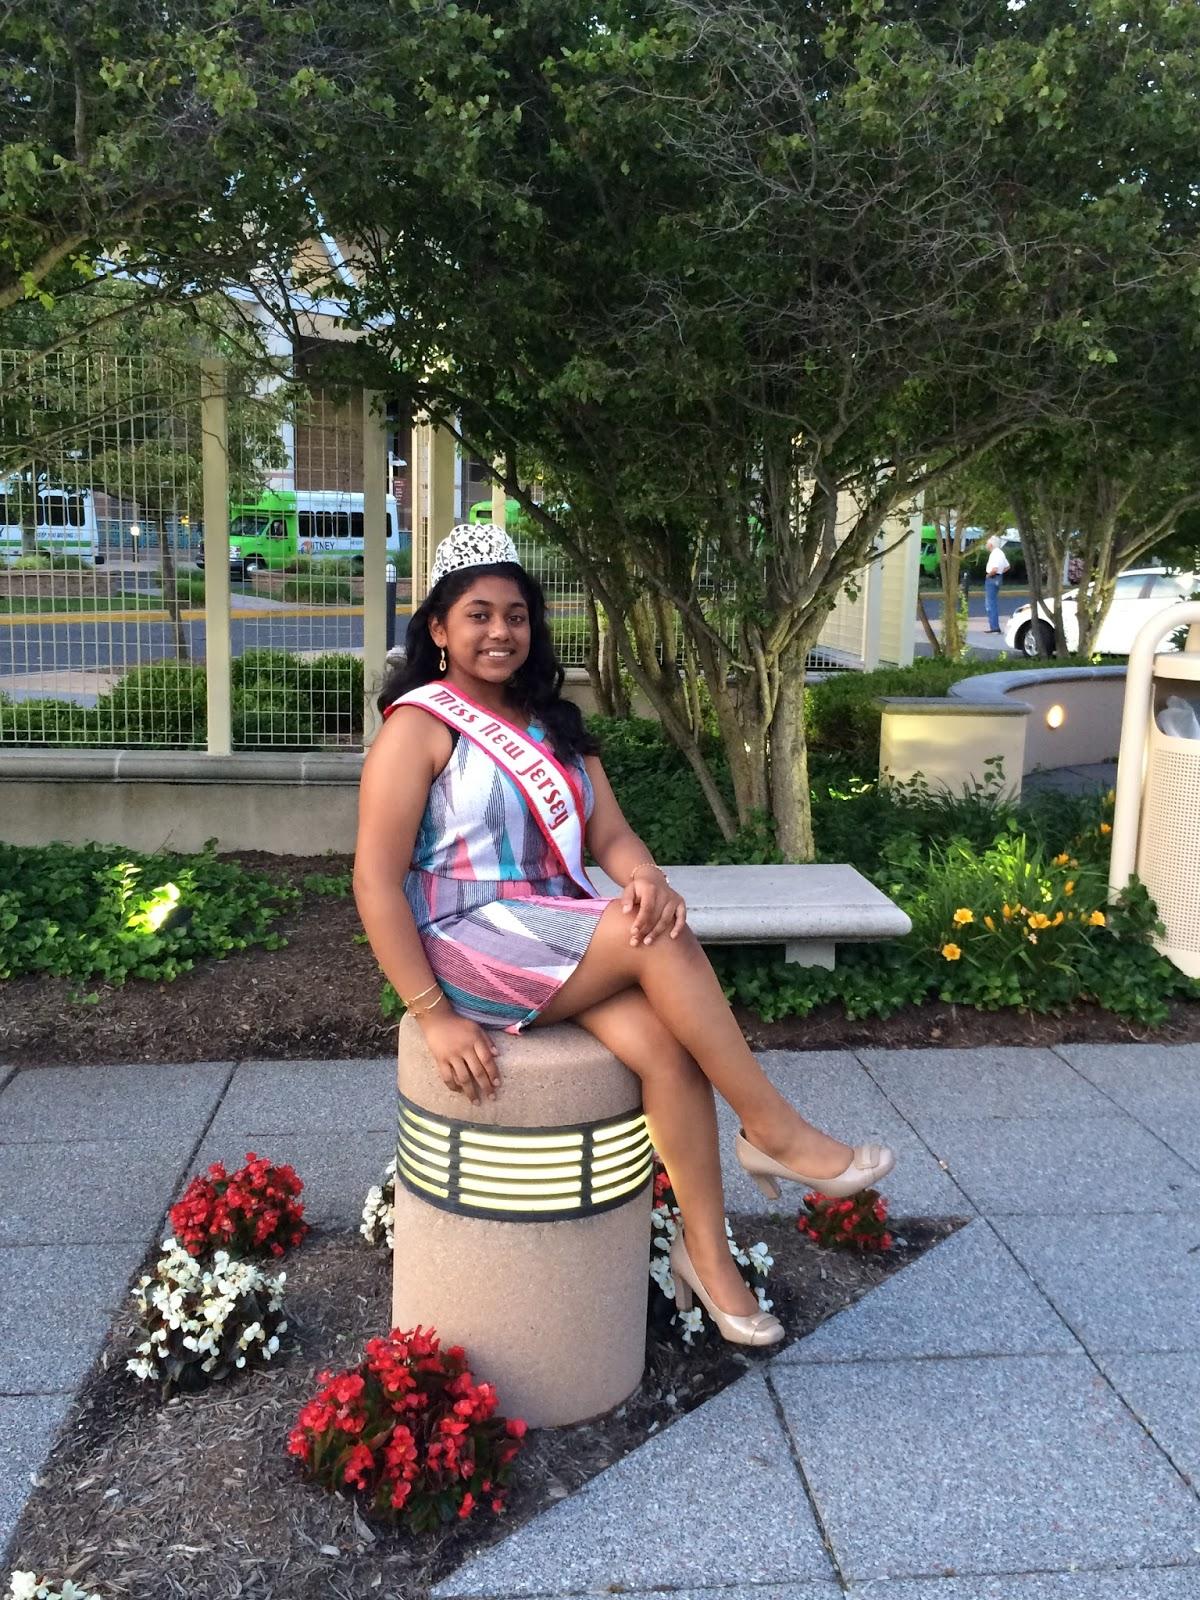 preteen stretch Miss New Jersey Princess 2014